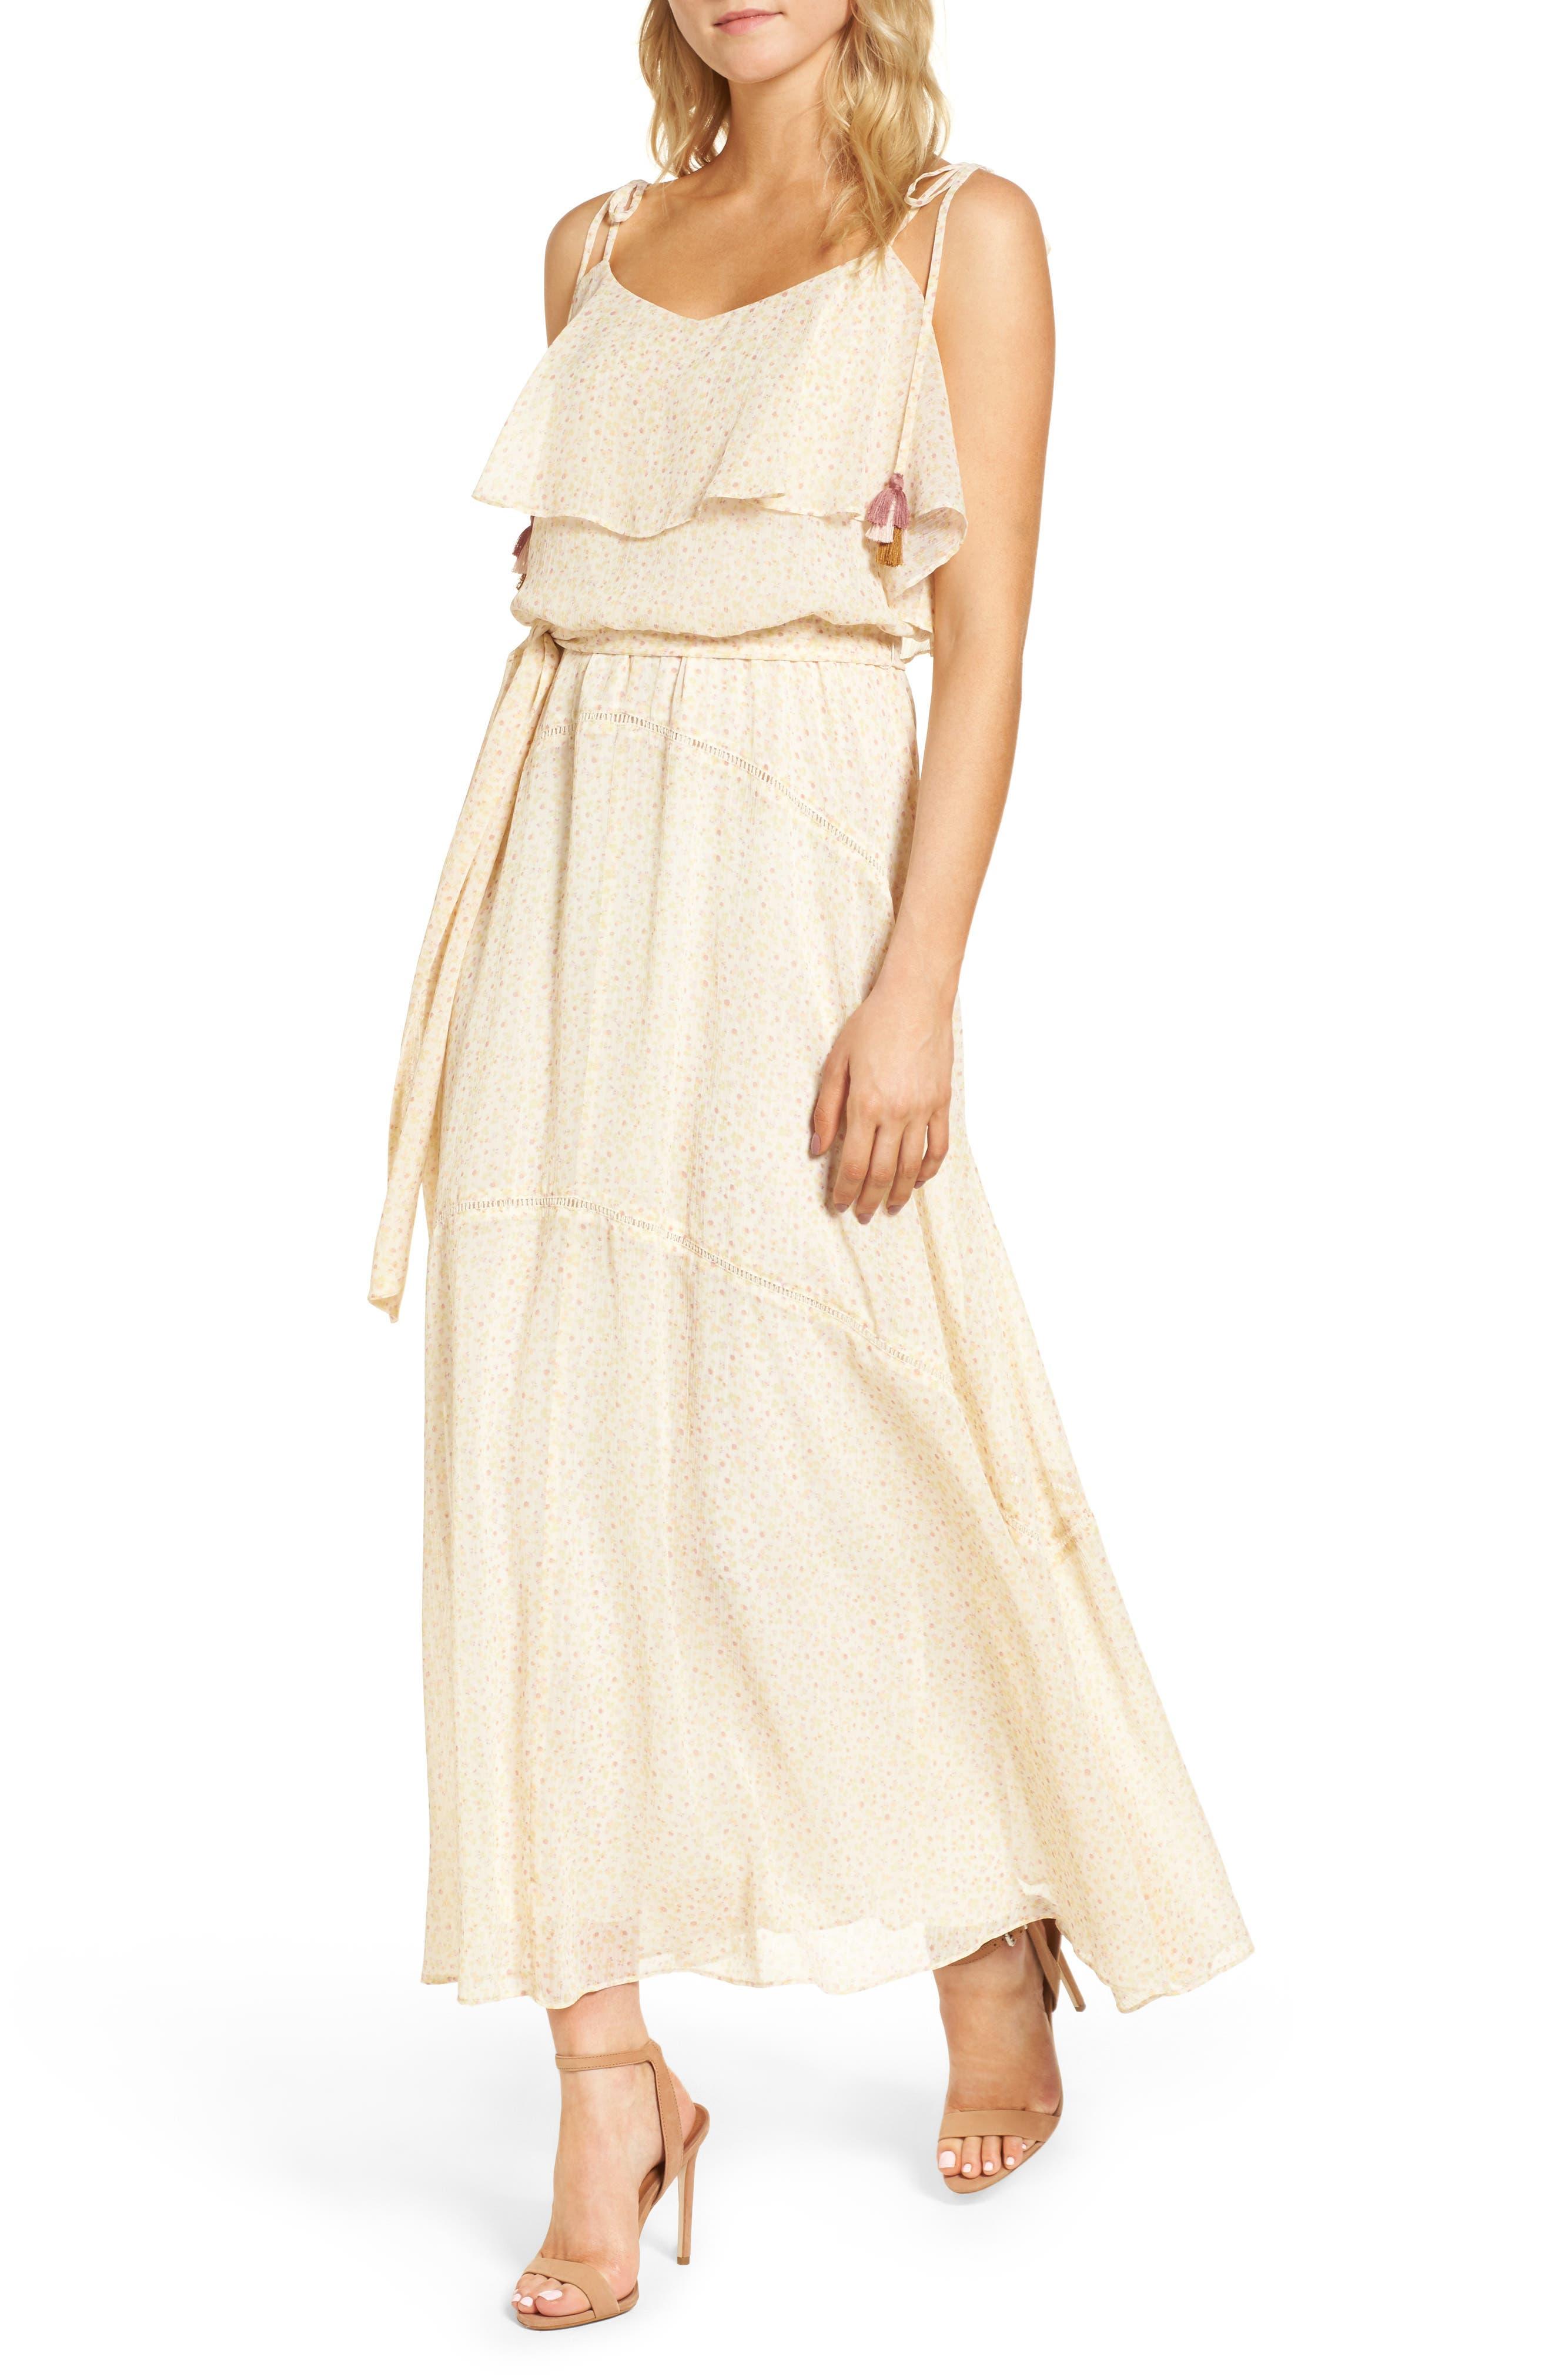 Decklan Maxi Dress,                         Main,                         color, Off White